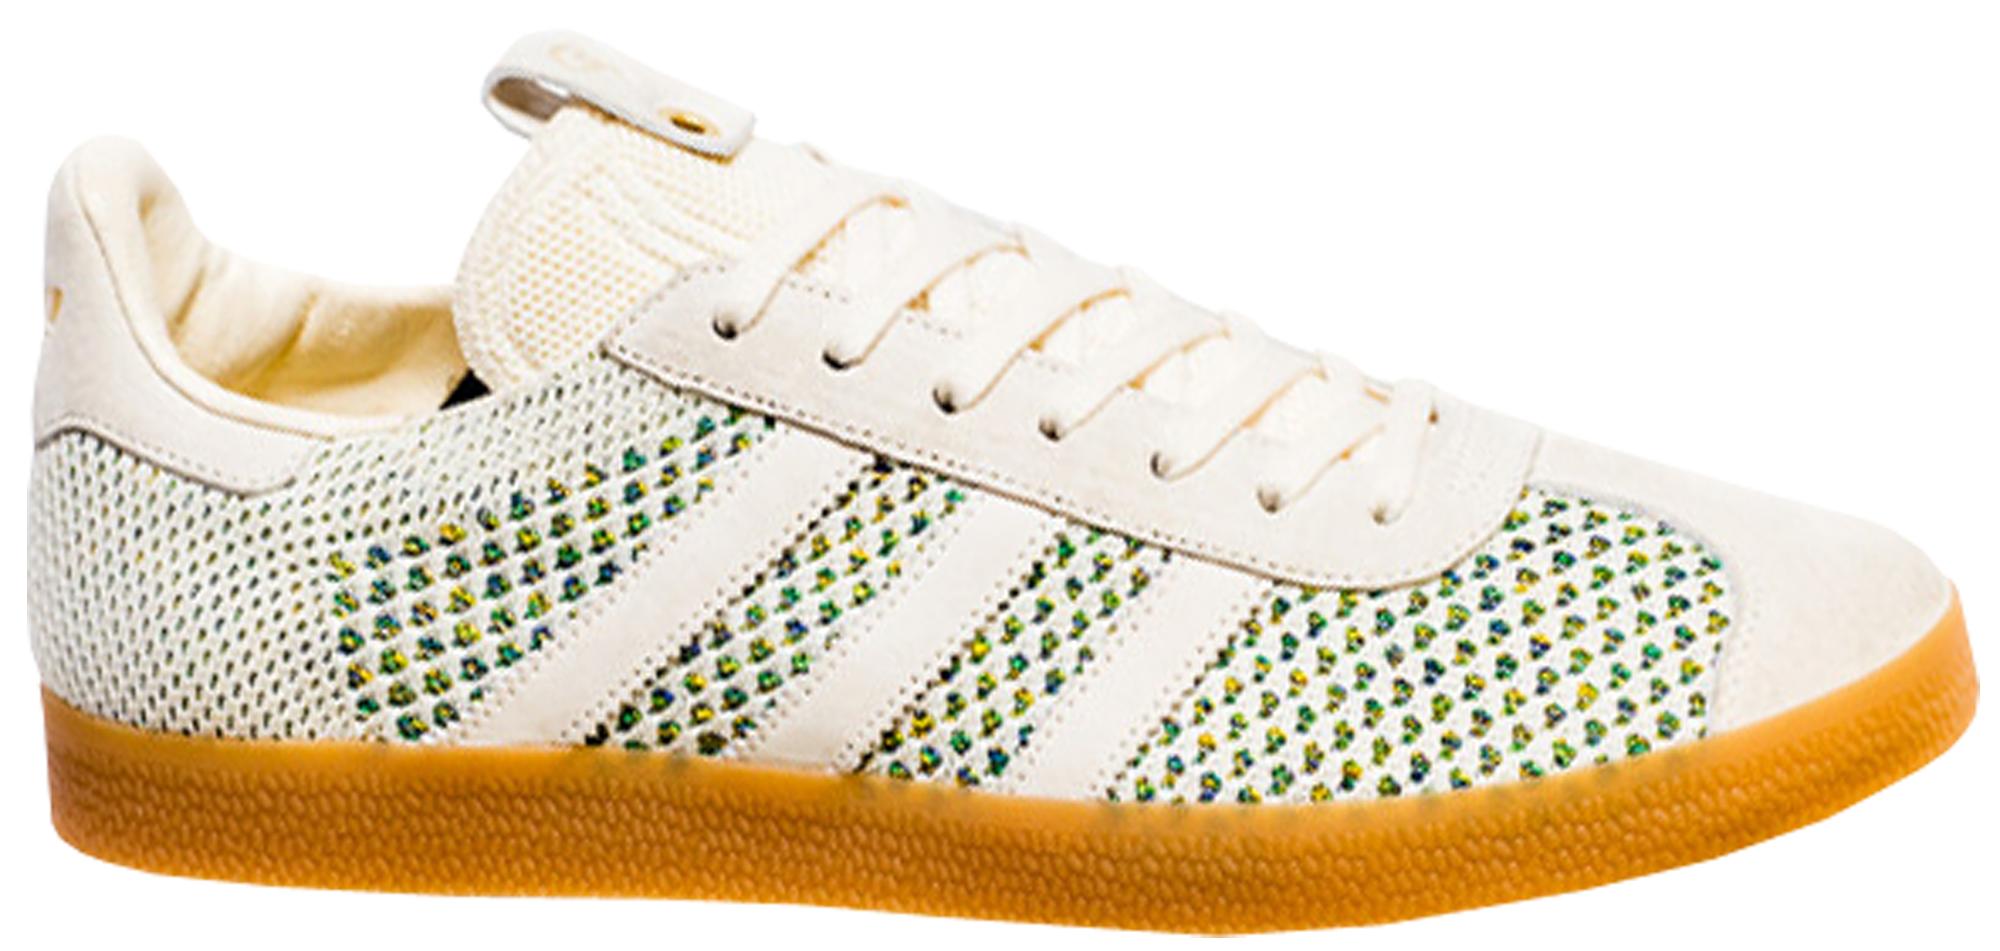 Mardi Adidas Gazelle Politics News Gras Pk Stockx rRtq1vR